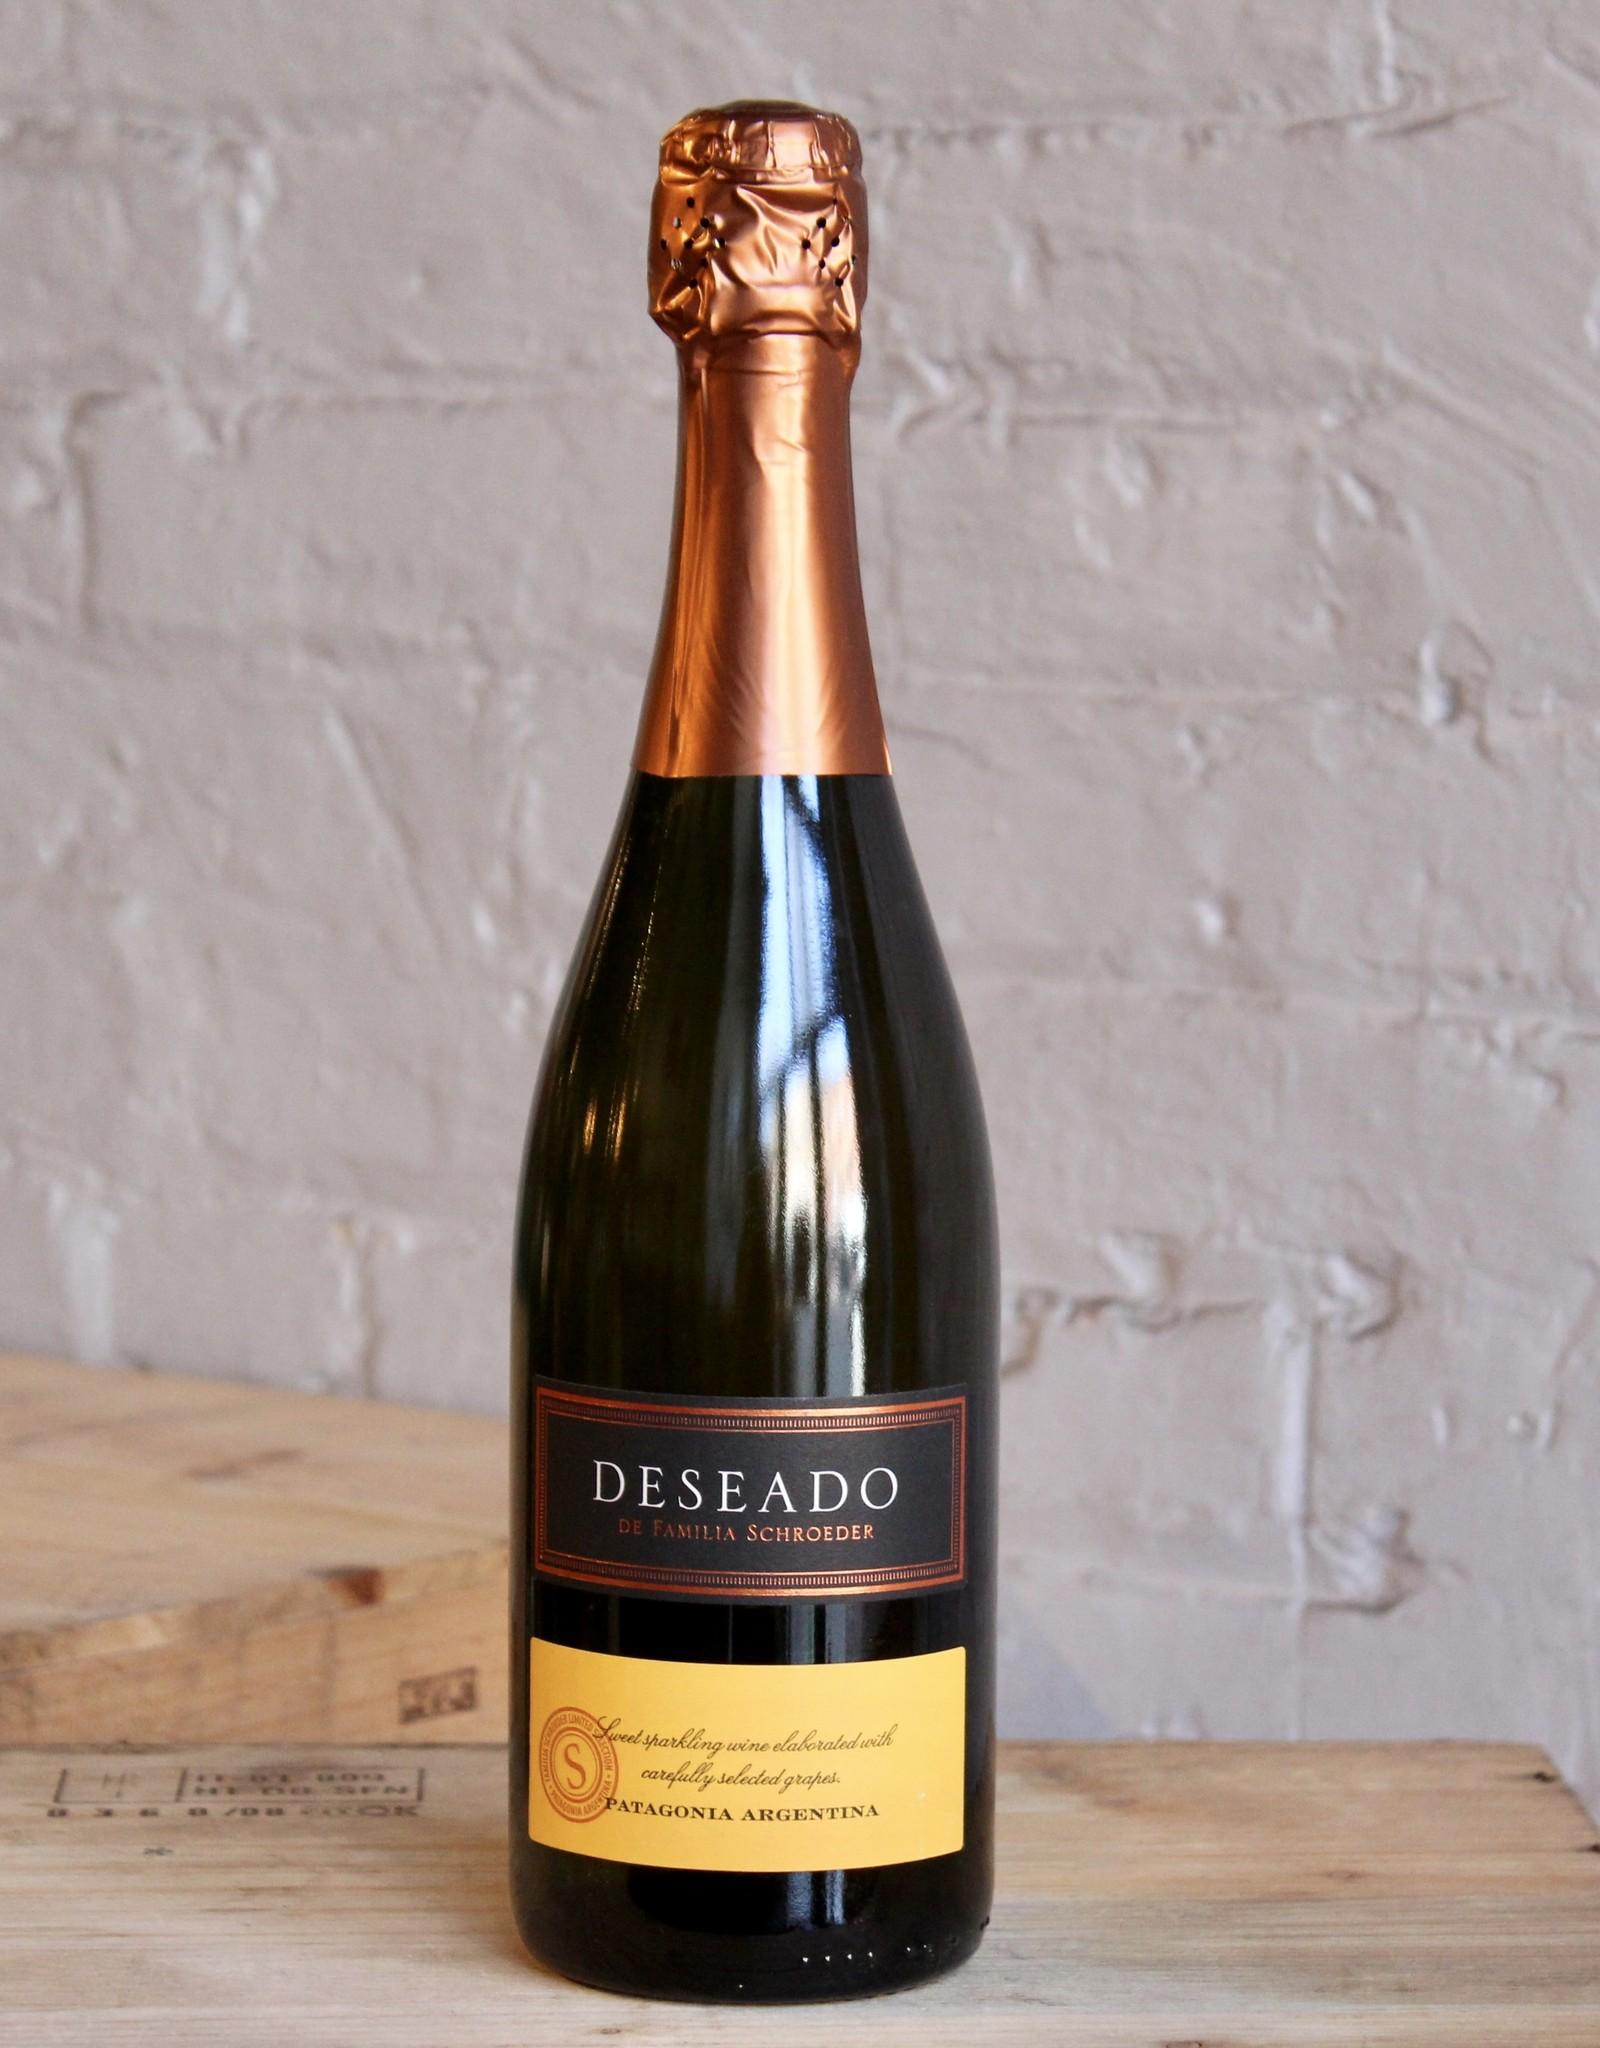 Wine NV Familia Schroeder 'Deseado' Sparkling Torrontes - Patagonia, Argentina (750ml)